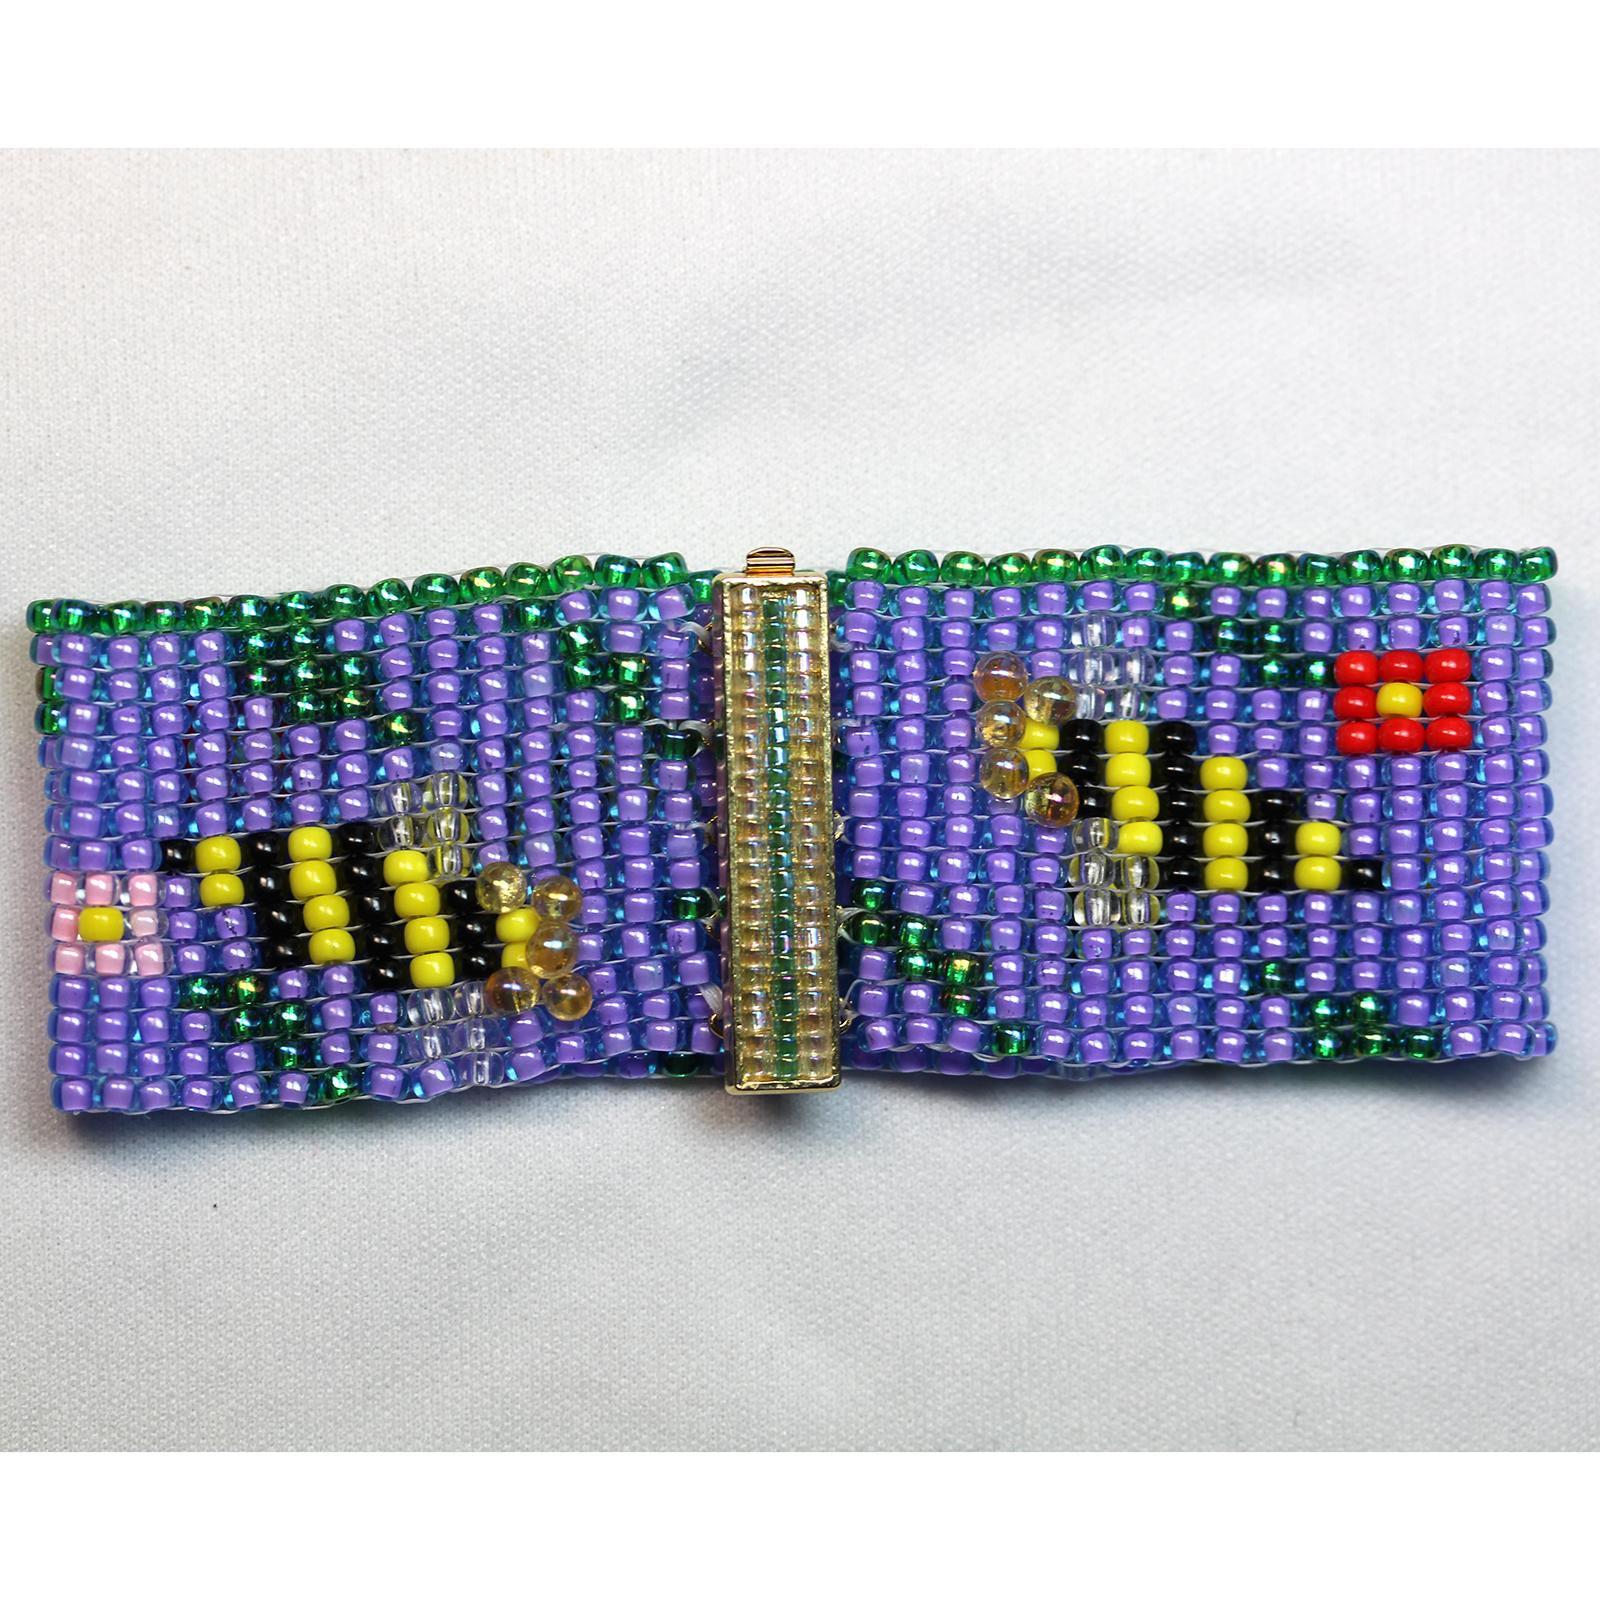 Designer Jewelry - Bees & Flower Loomed Bracelet Pattern